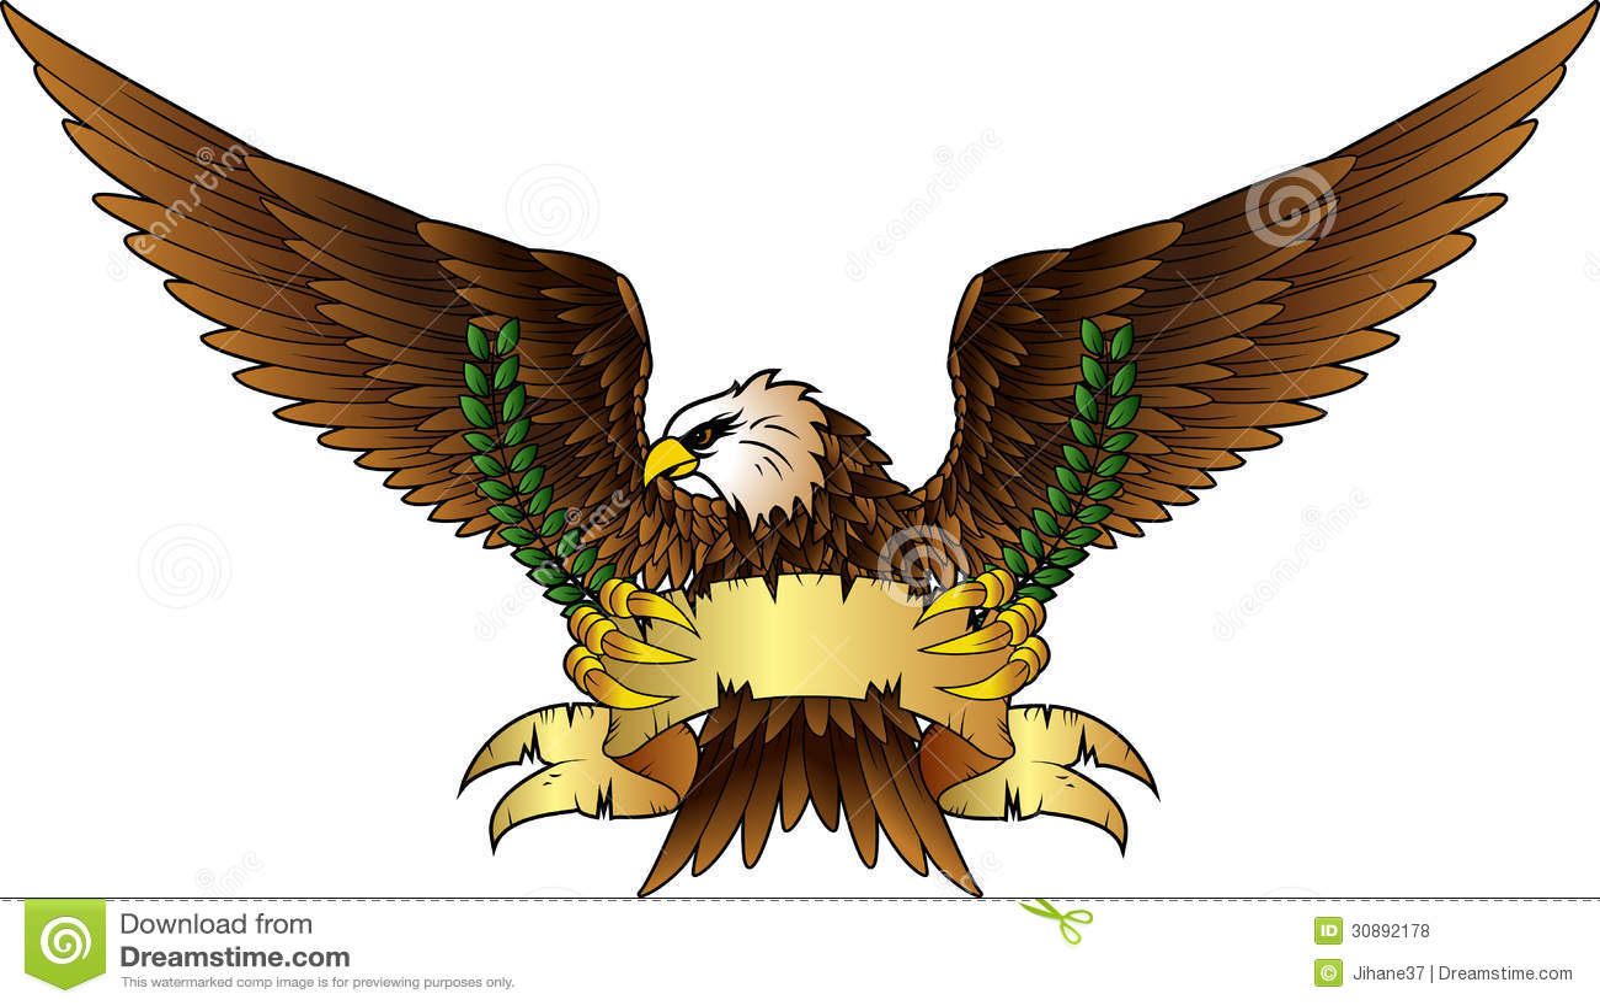 Spread winged eagle insignia  Eagle Wings Spread Clipart Black And White